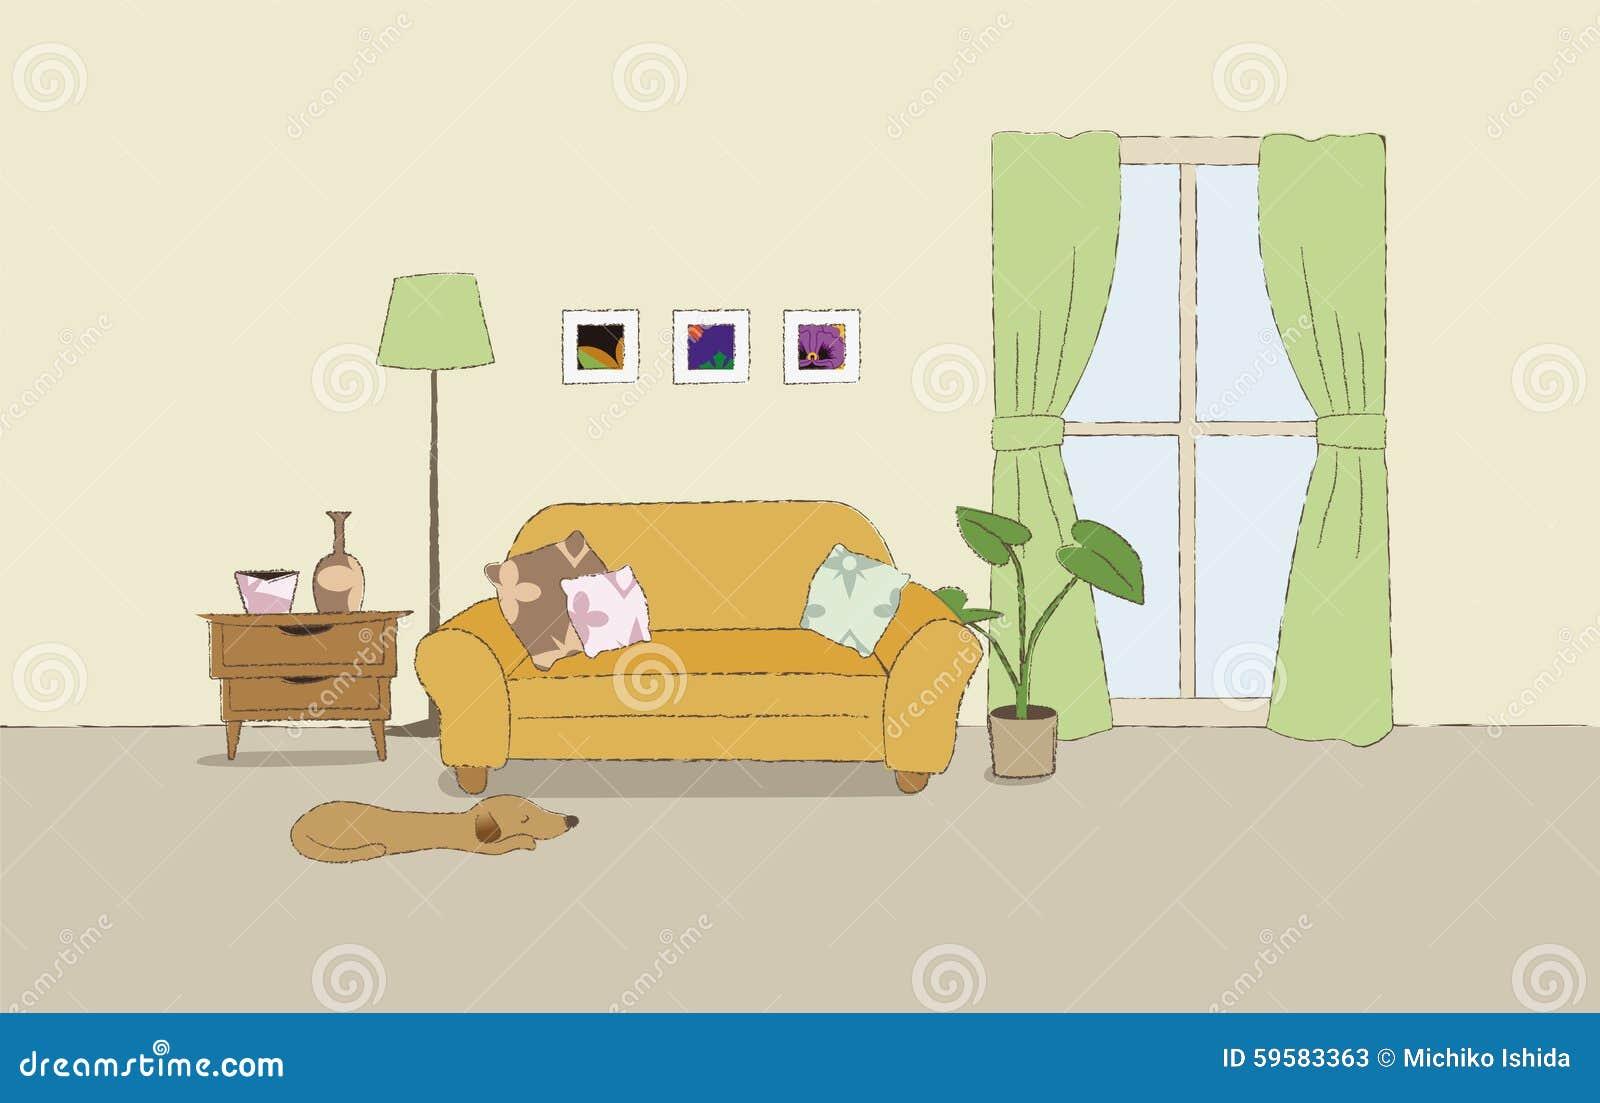 Cozy Living Room Illustration Stock Vector - Illustration of lanp ...